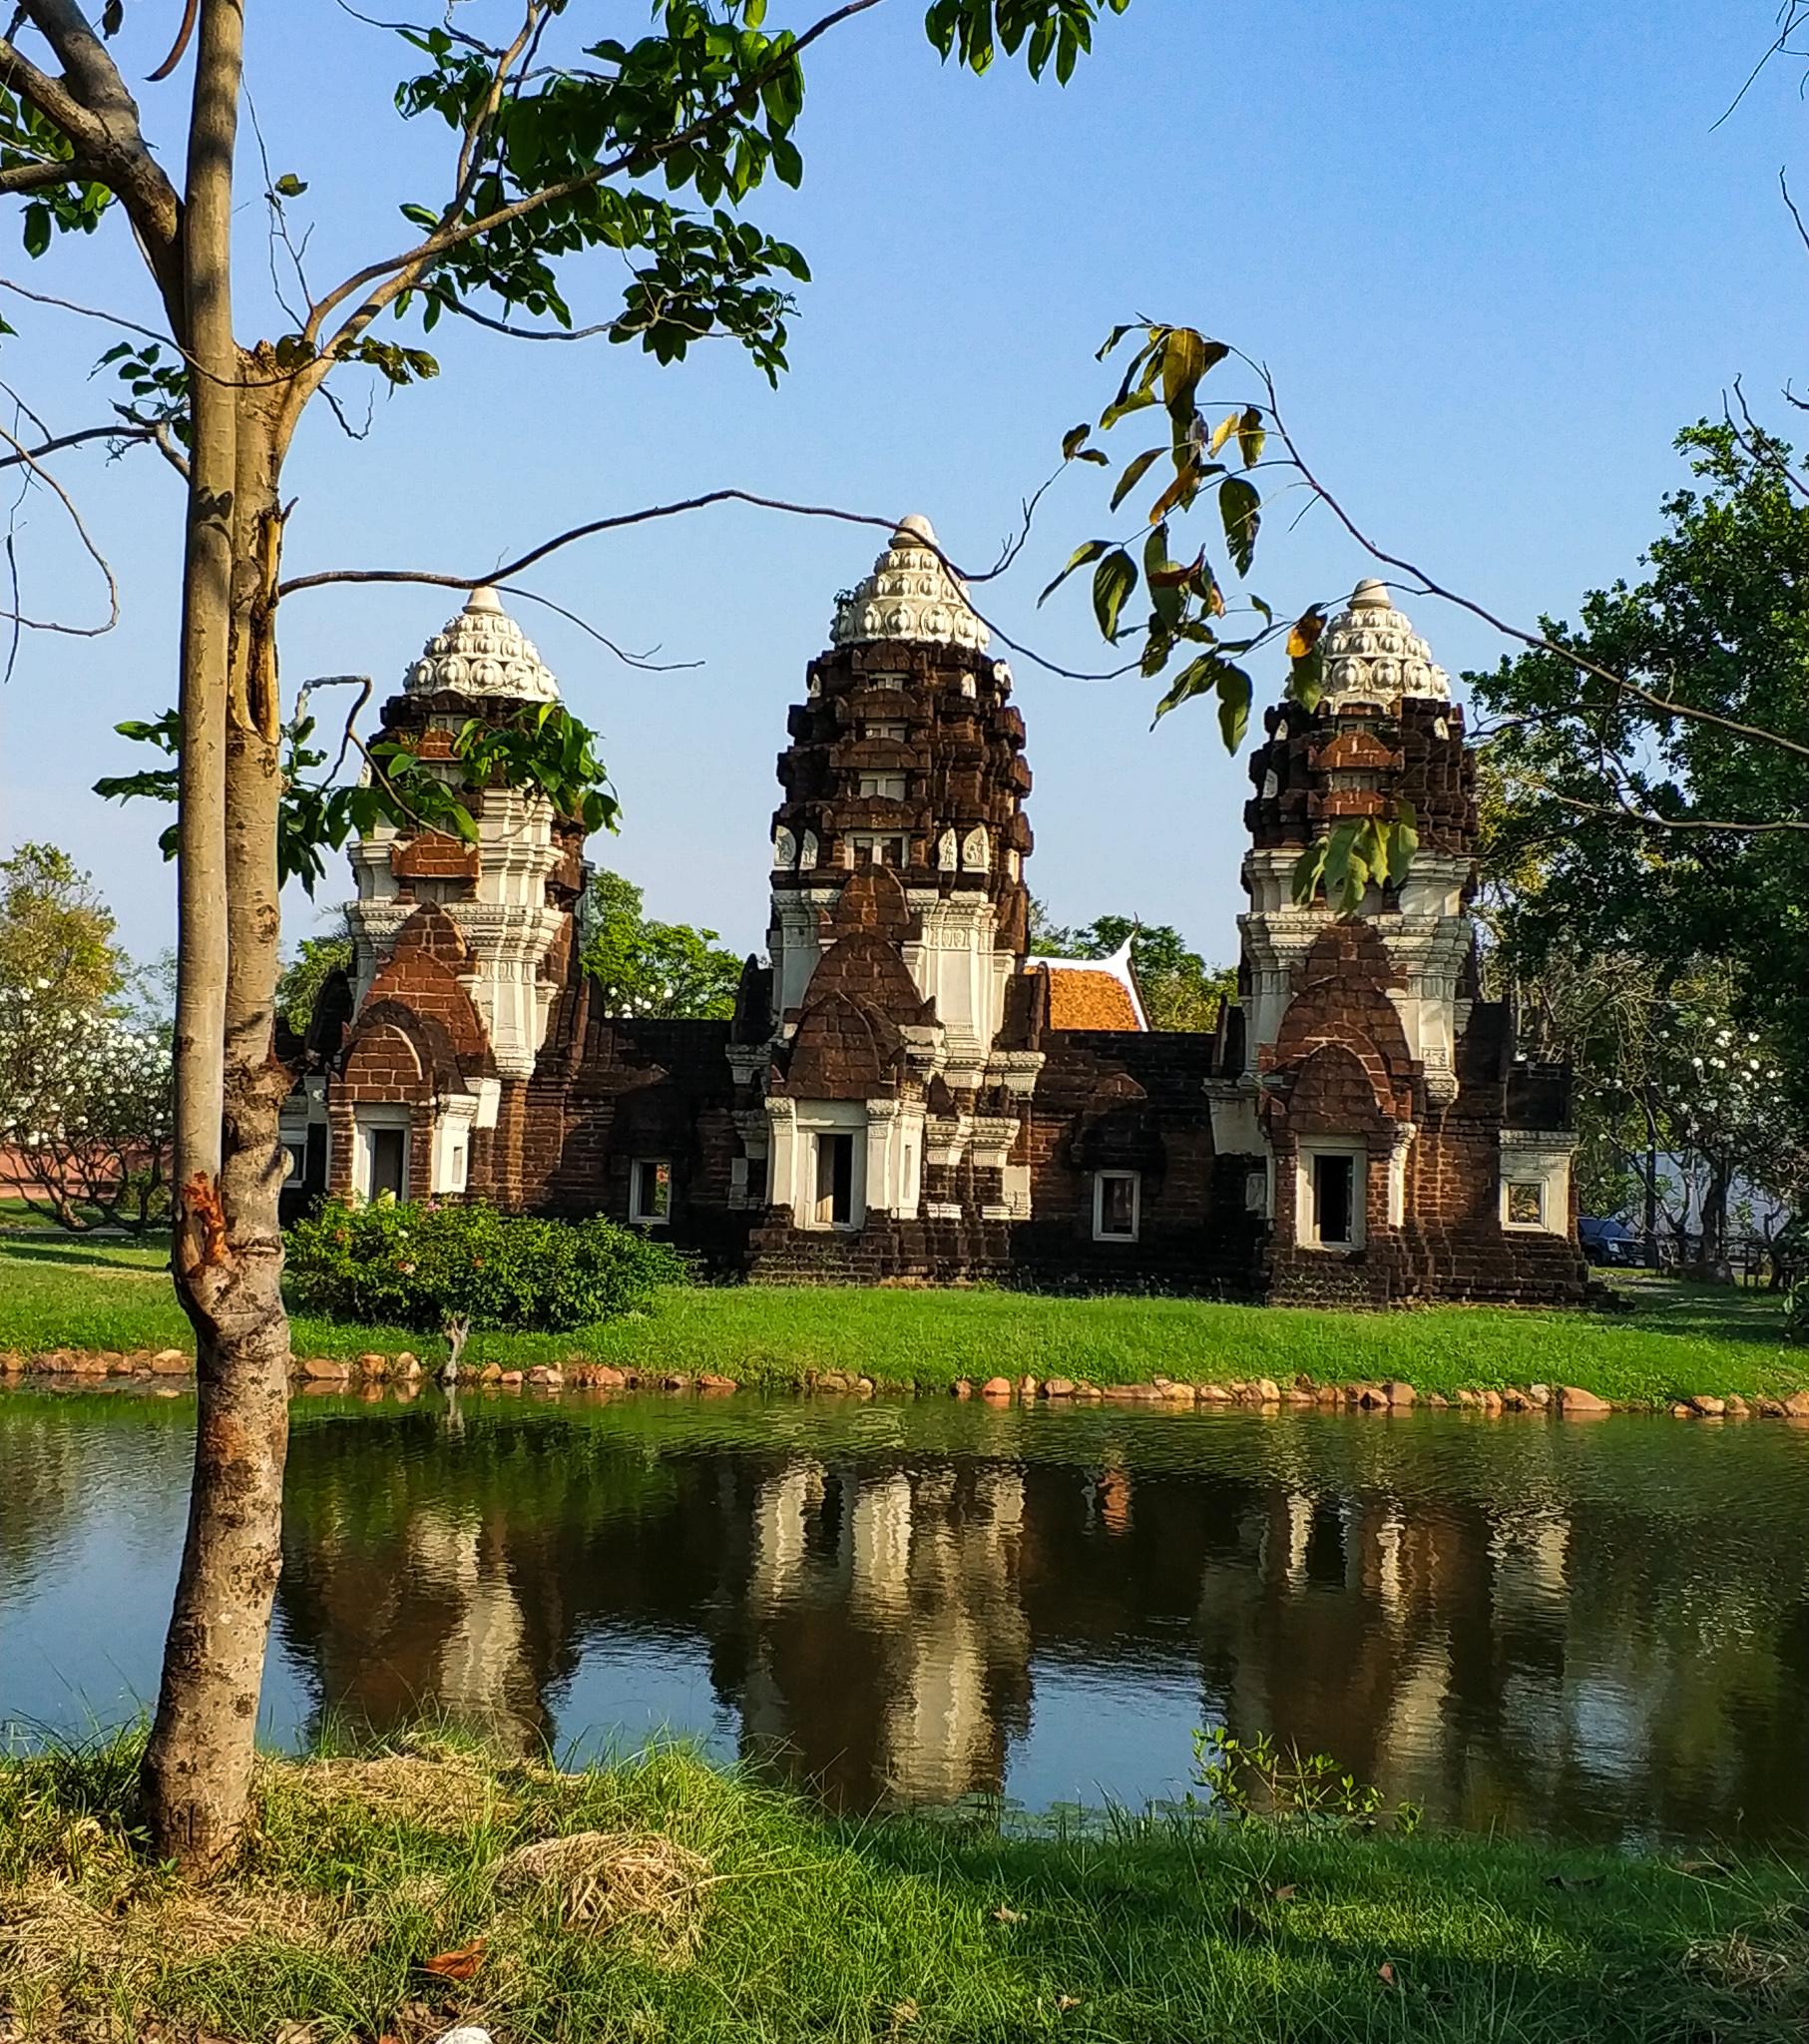 Phra Prang Sam Yod, Lop Buri